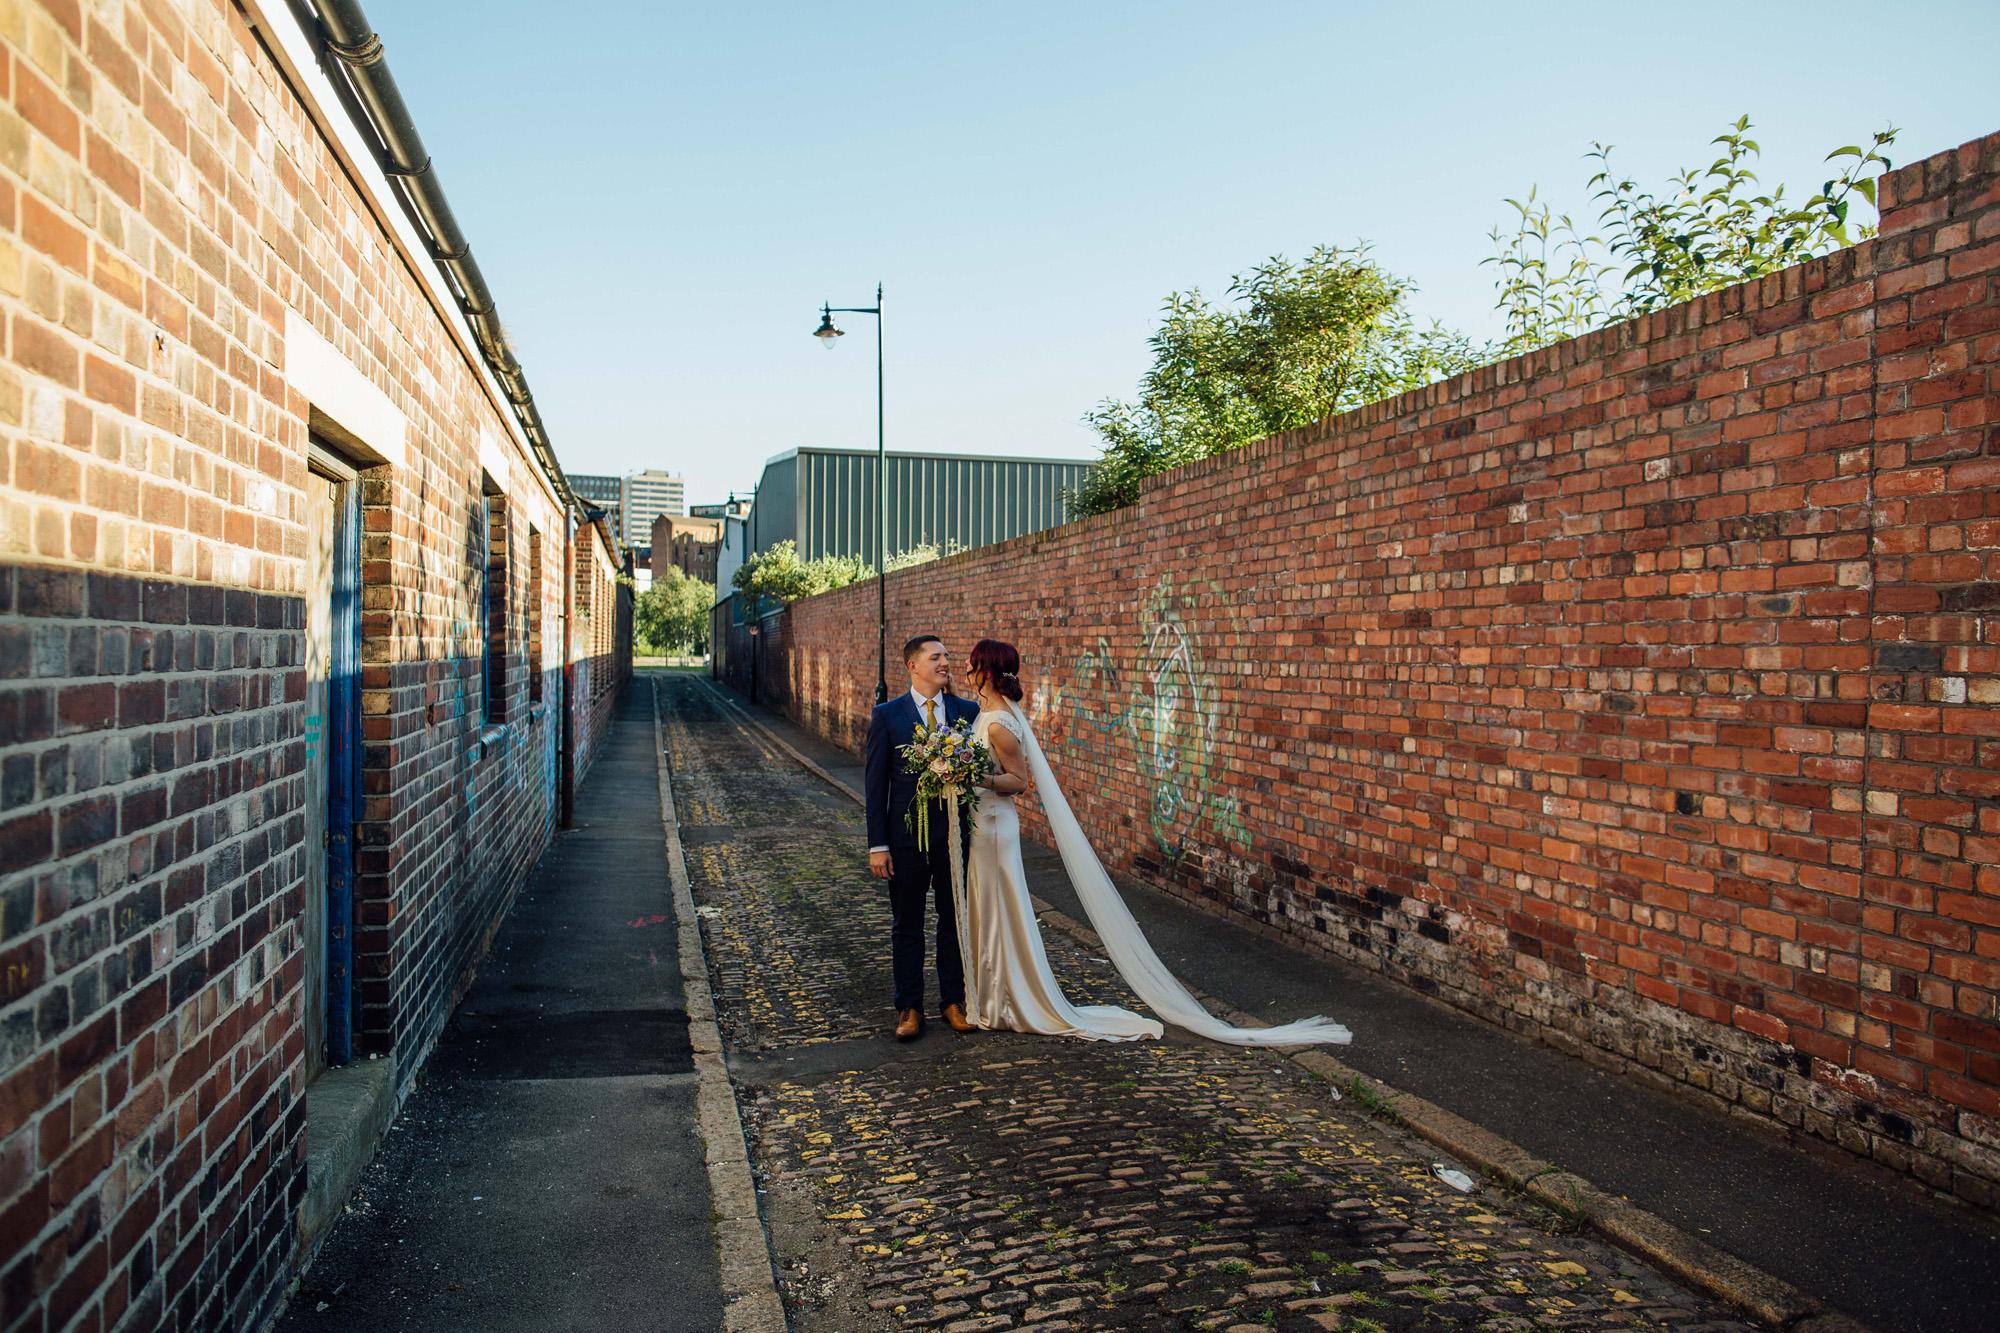 Sarah-Honeysuckle-Bias-Cut-Silk-Vintage-Inspired-Wedding-Gown-Sheffield-Wedding-Kate-Beaumont-55.jpg